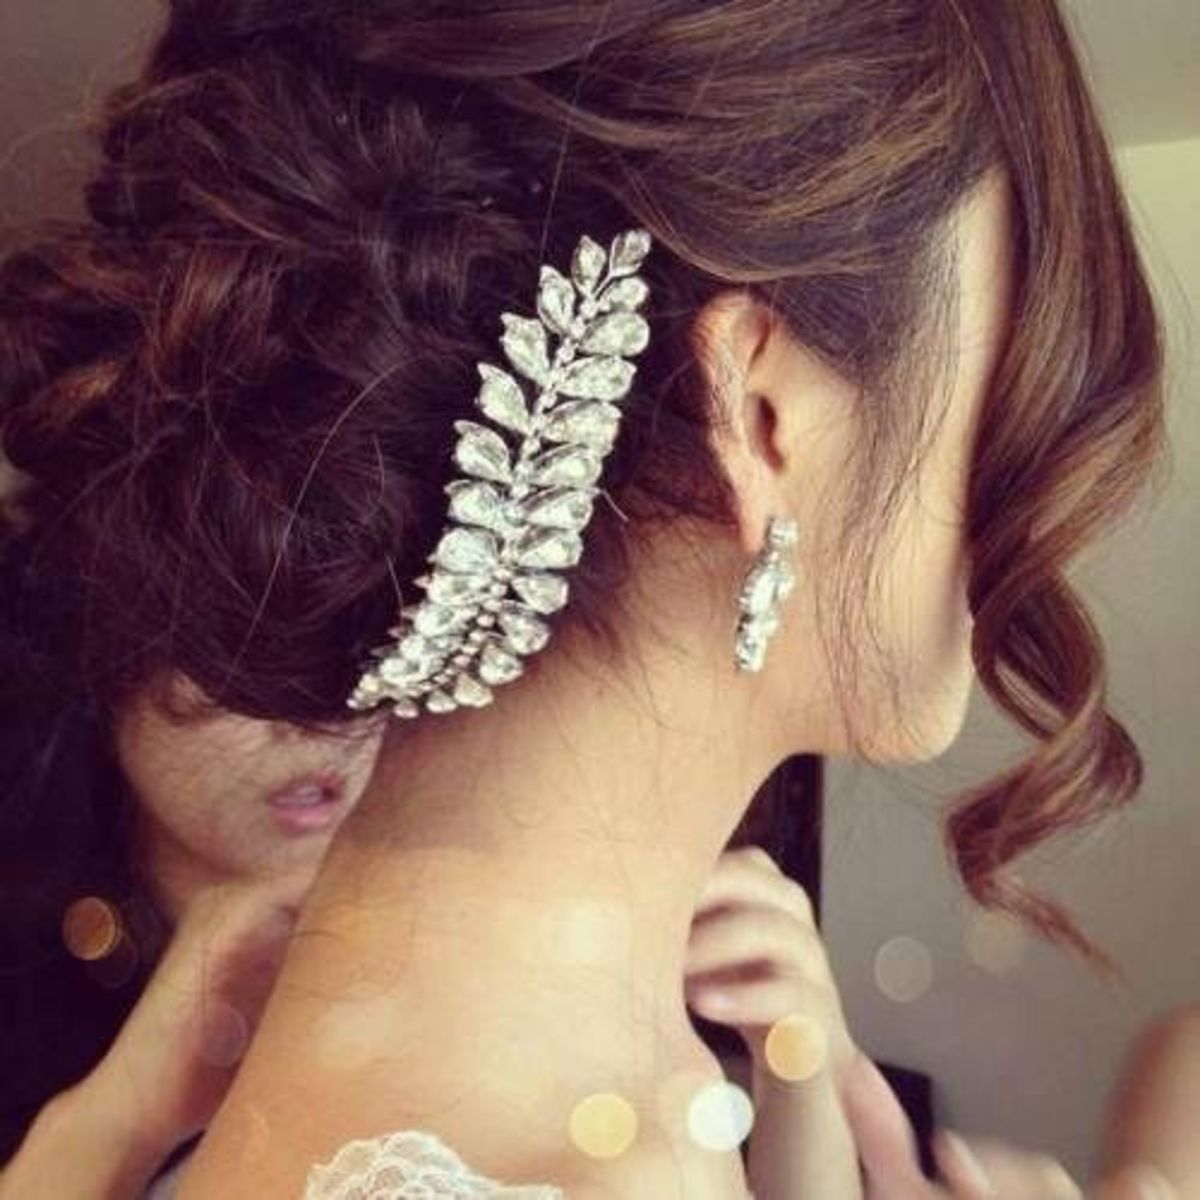 beautful hair bun with below the bun stone jewellery perfect for a wedding look